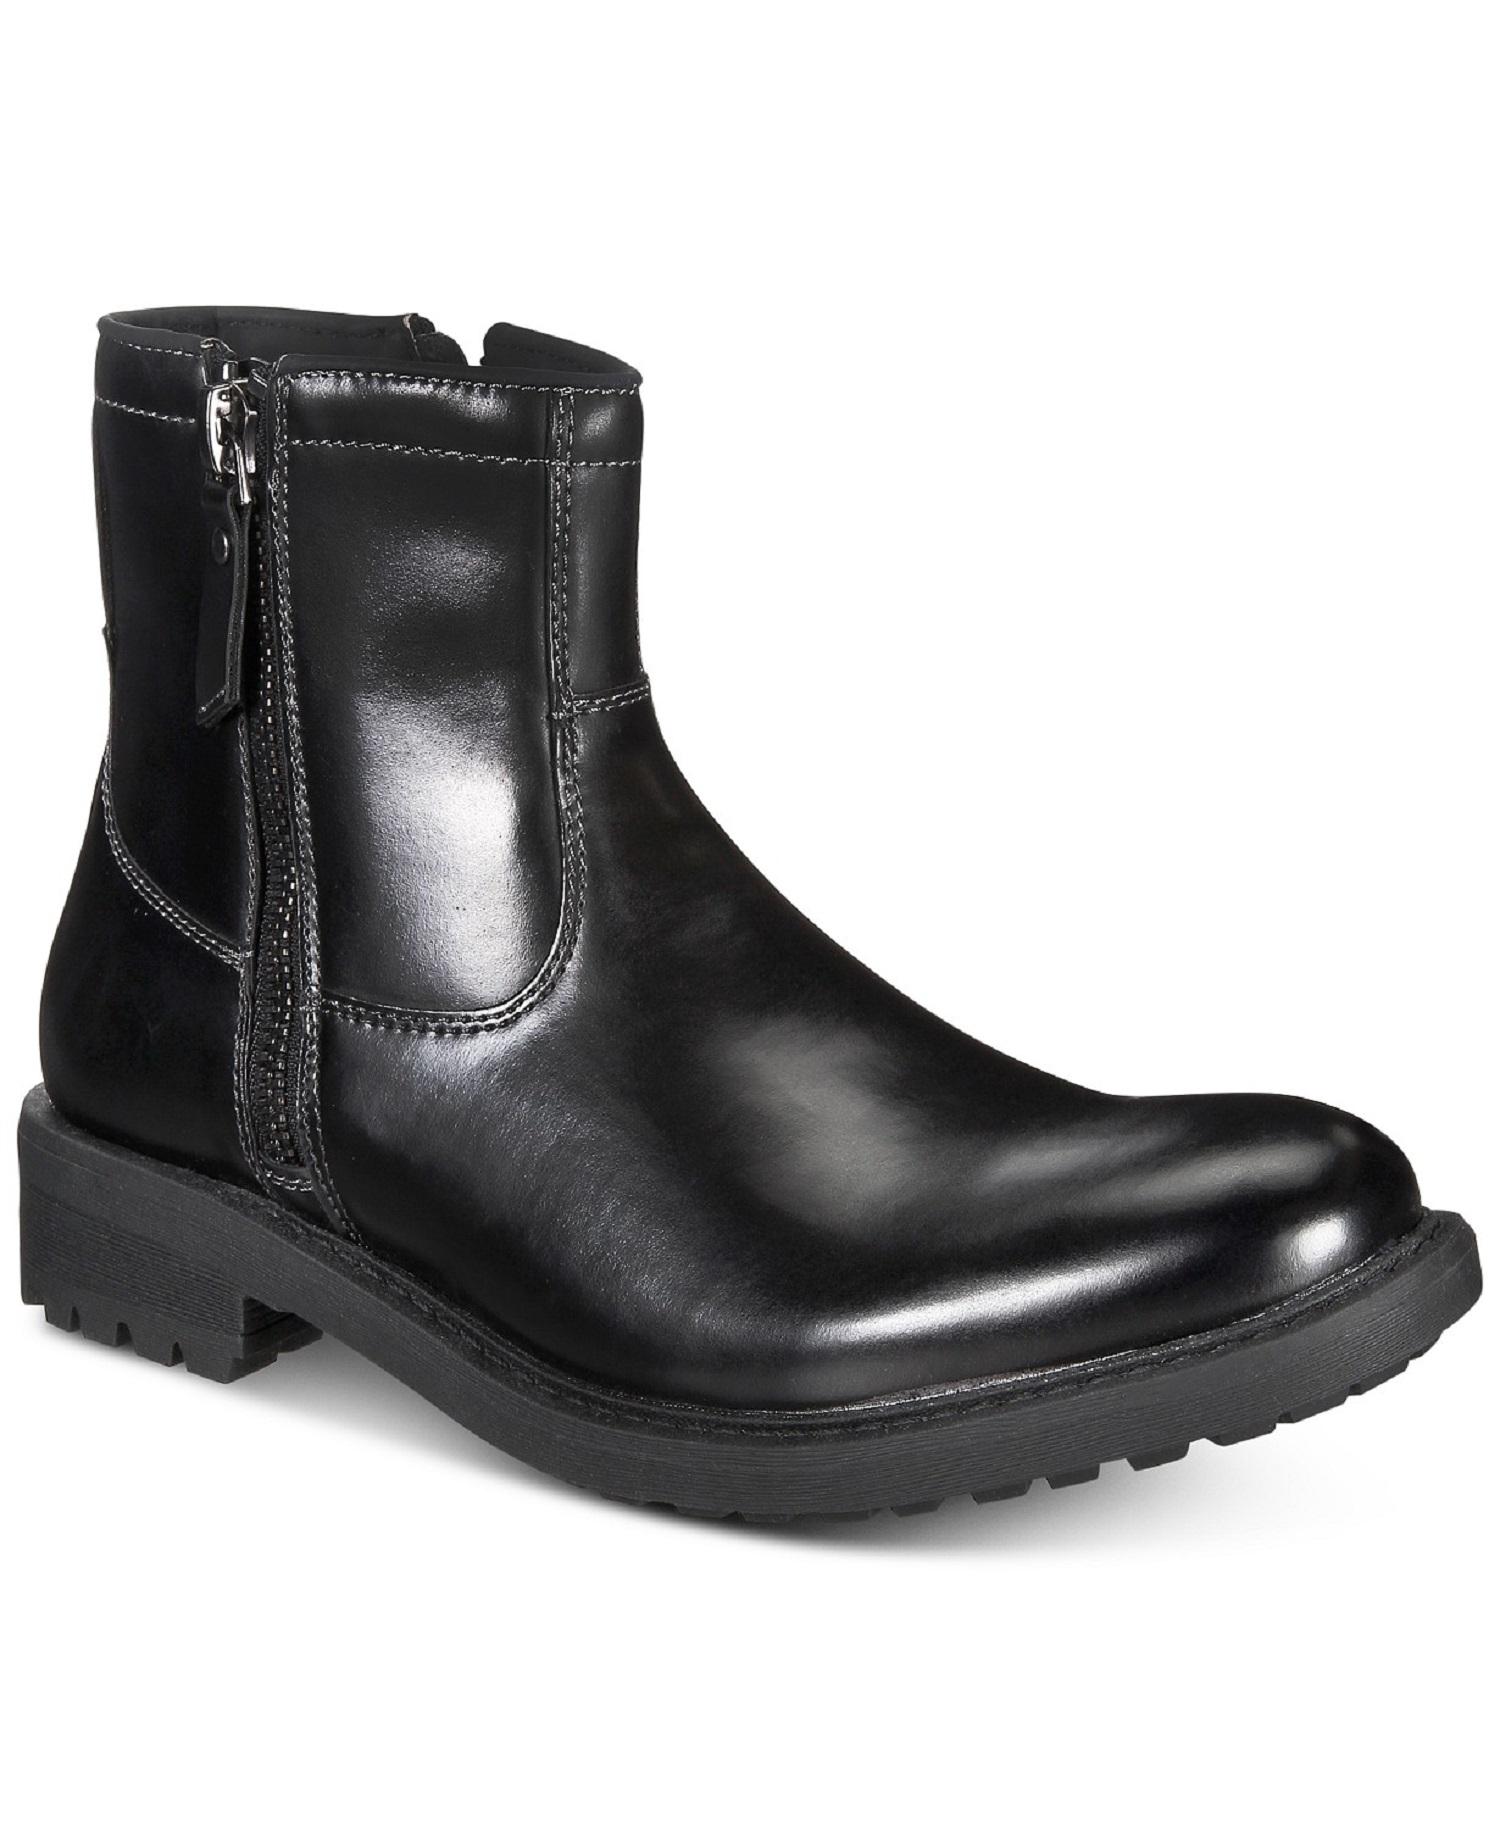 f902780af92 Kenneth Cole Unlisted C Roam Mens Black Casual Dress ZIPPER BOOTS ...